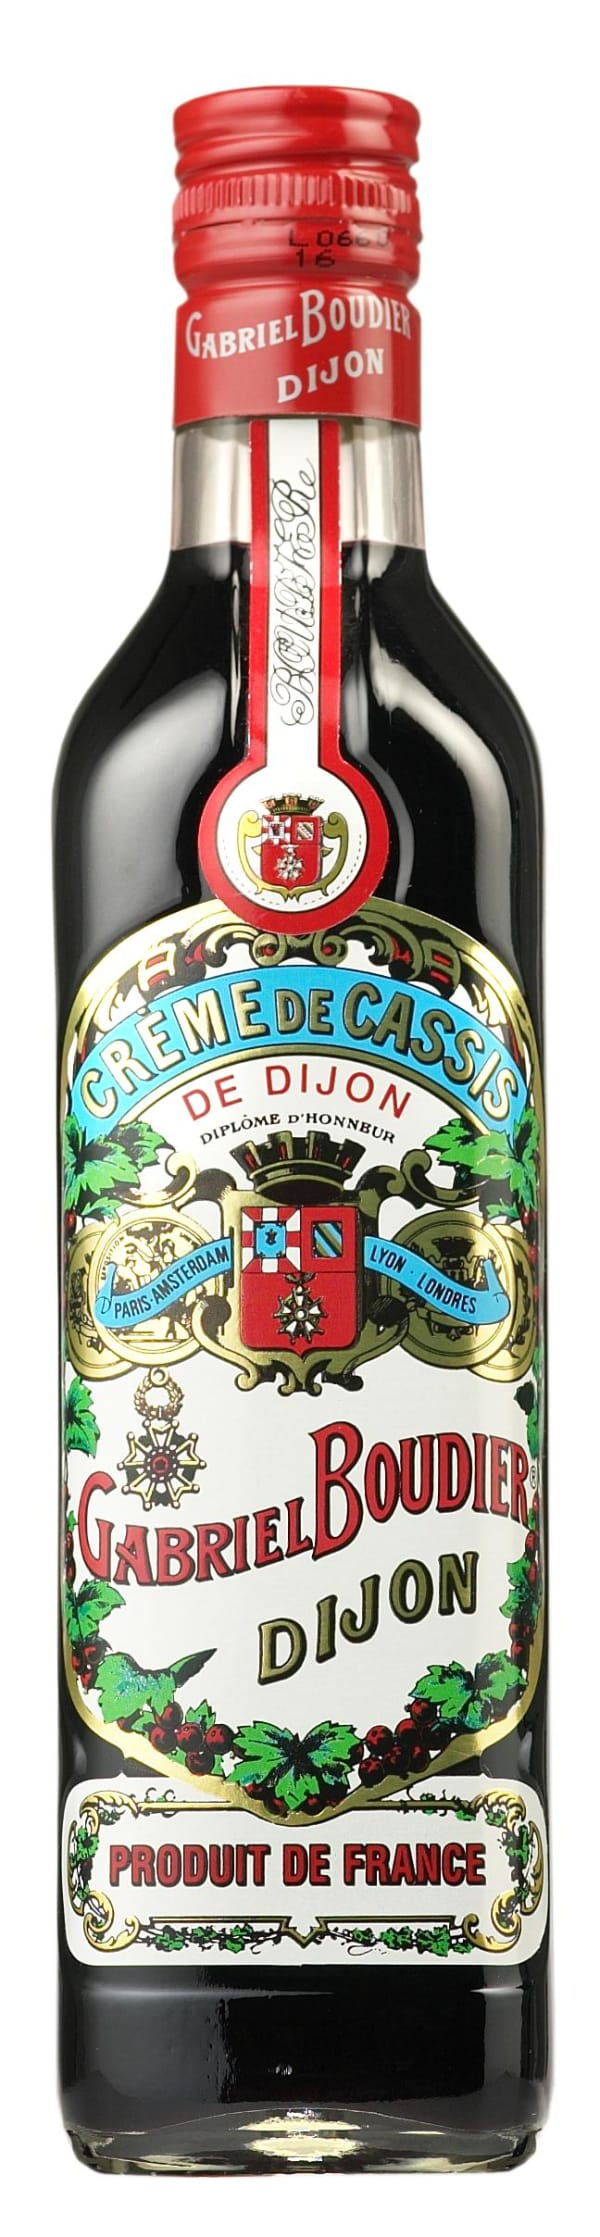 Crème de Cassis de Dijon